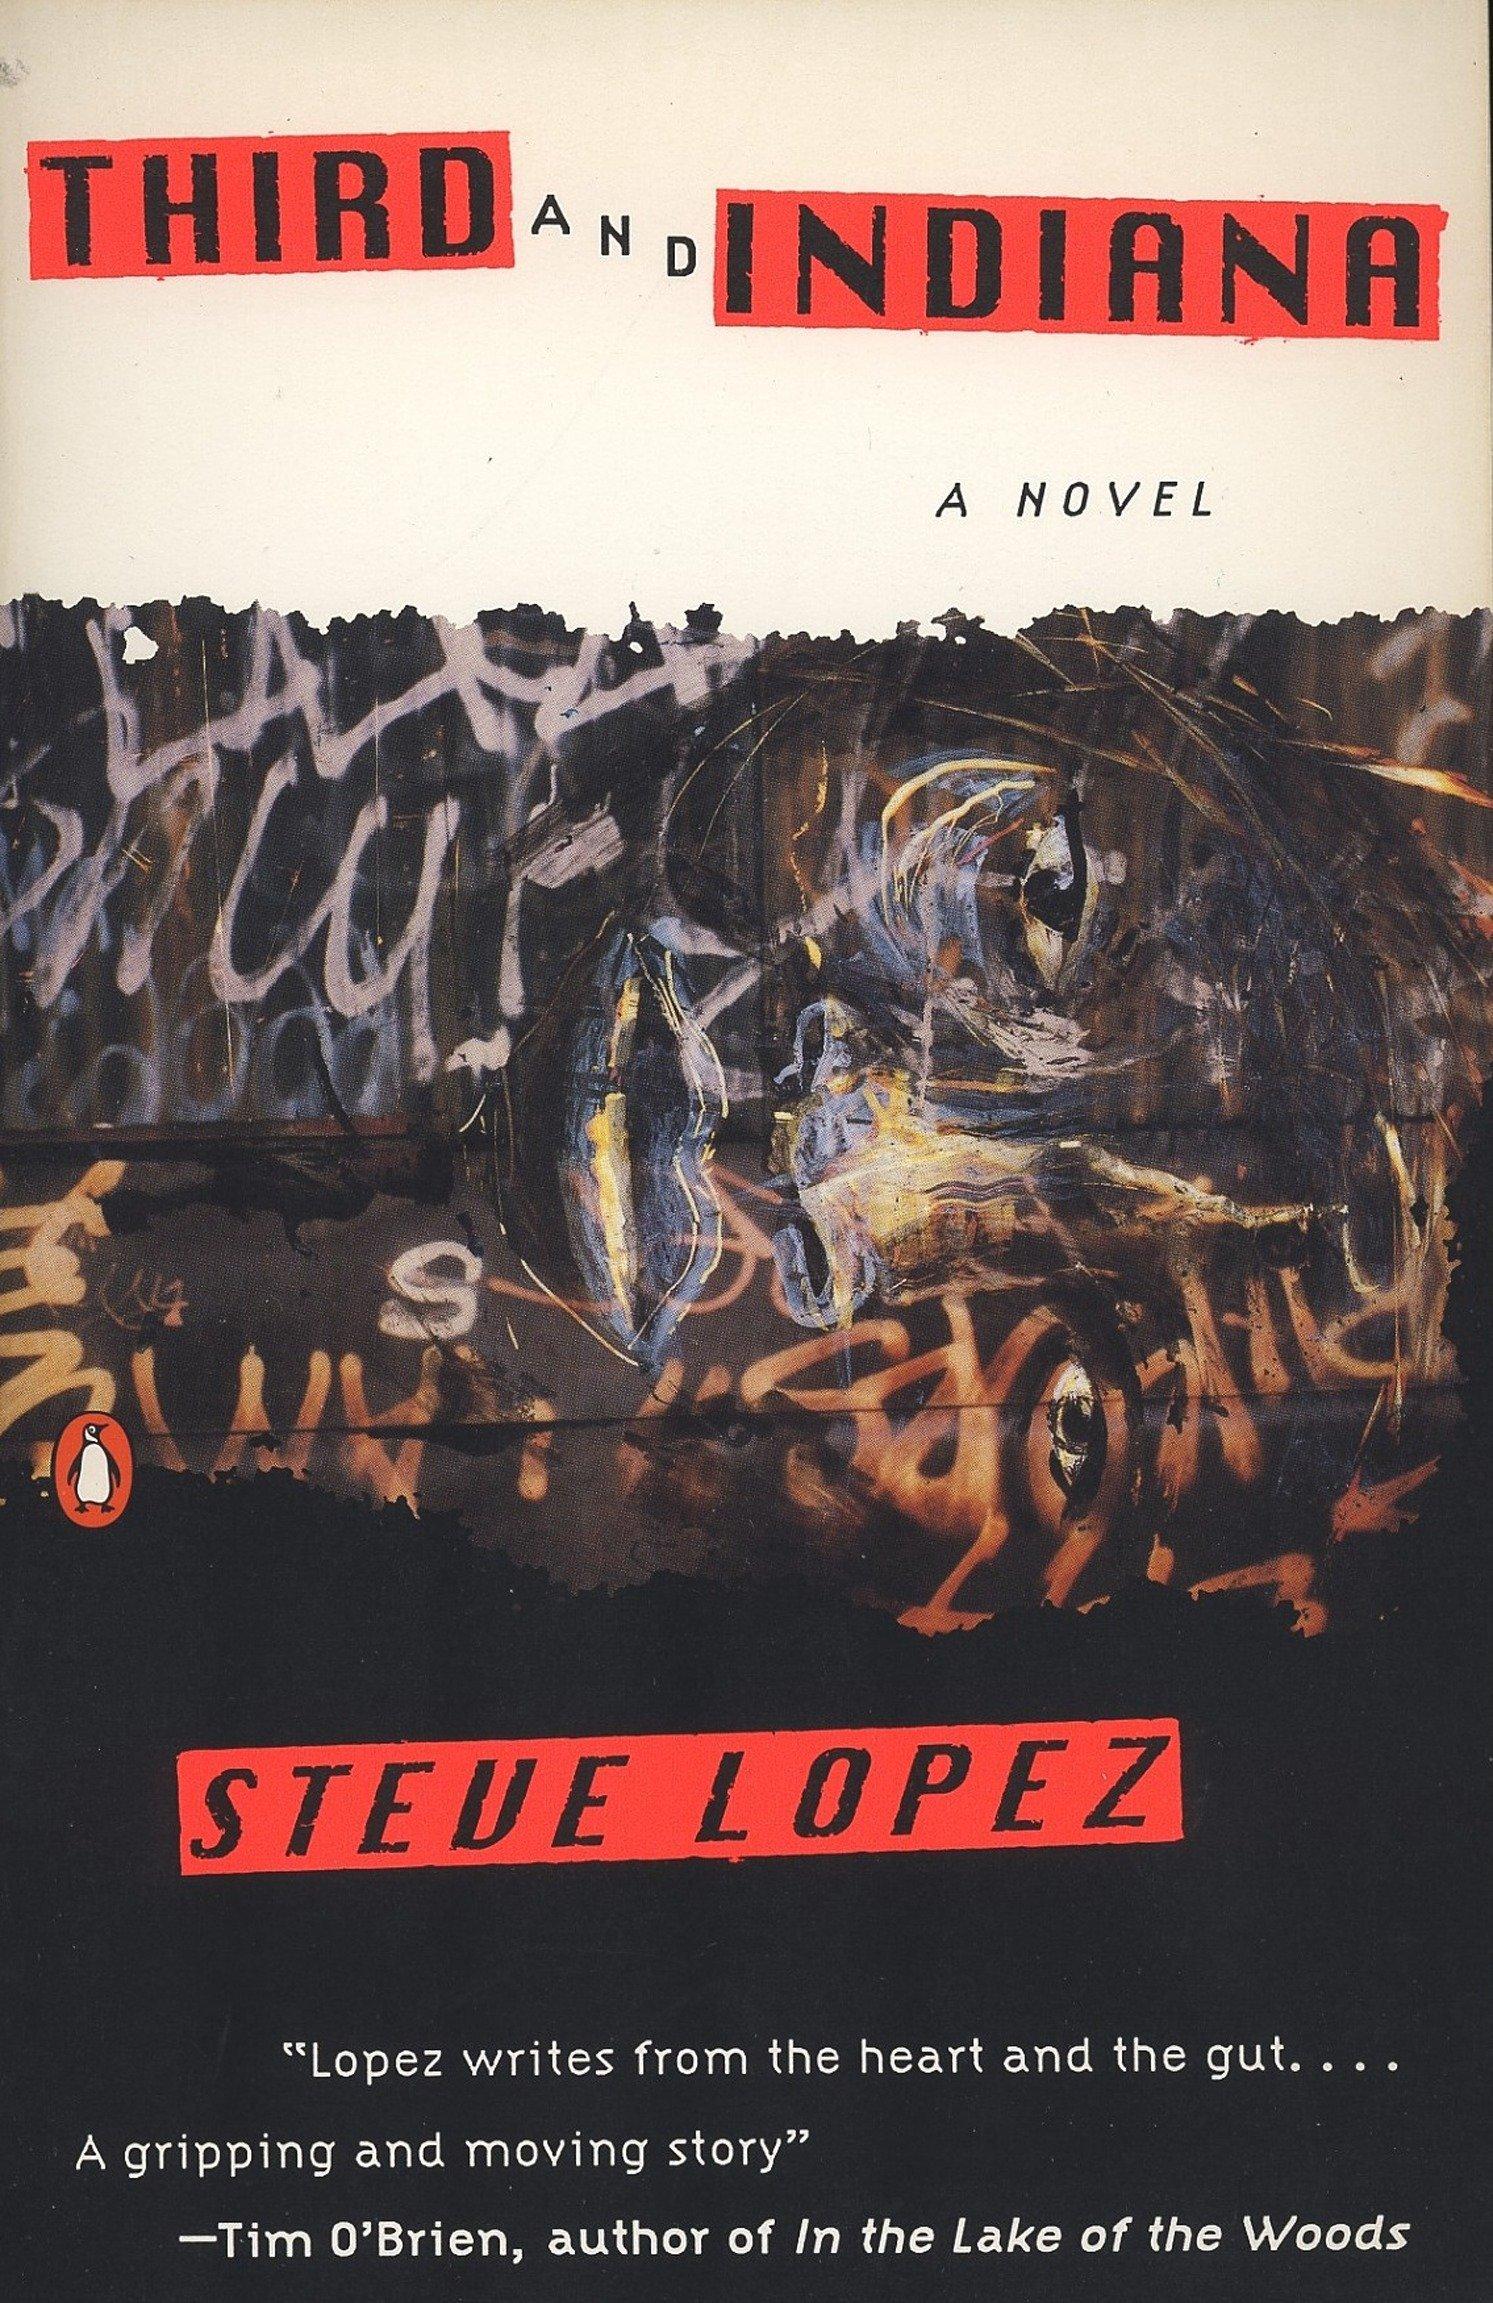 Amazon.com: Third and Indiana: A Novel (9780140239454): Steve Lopez: Books